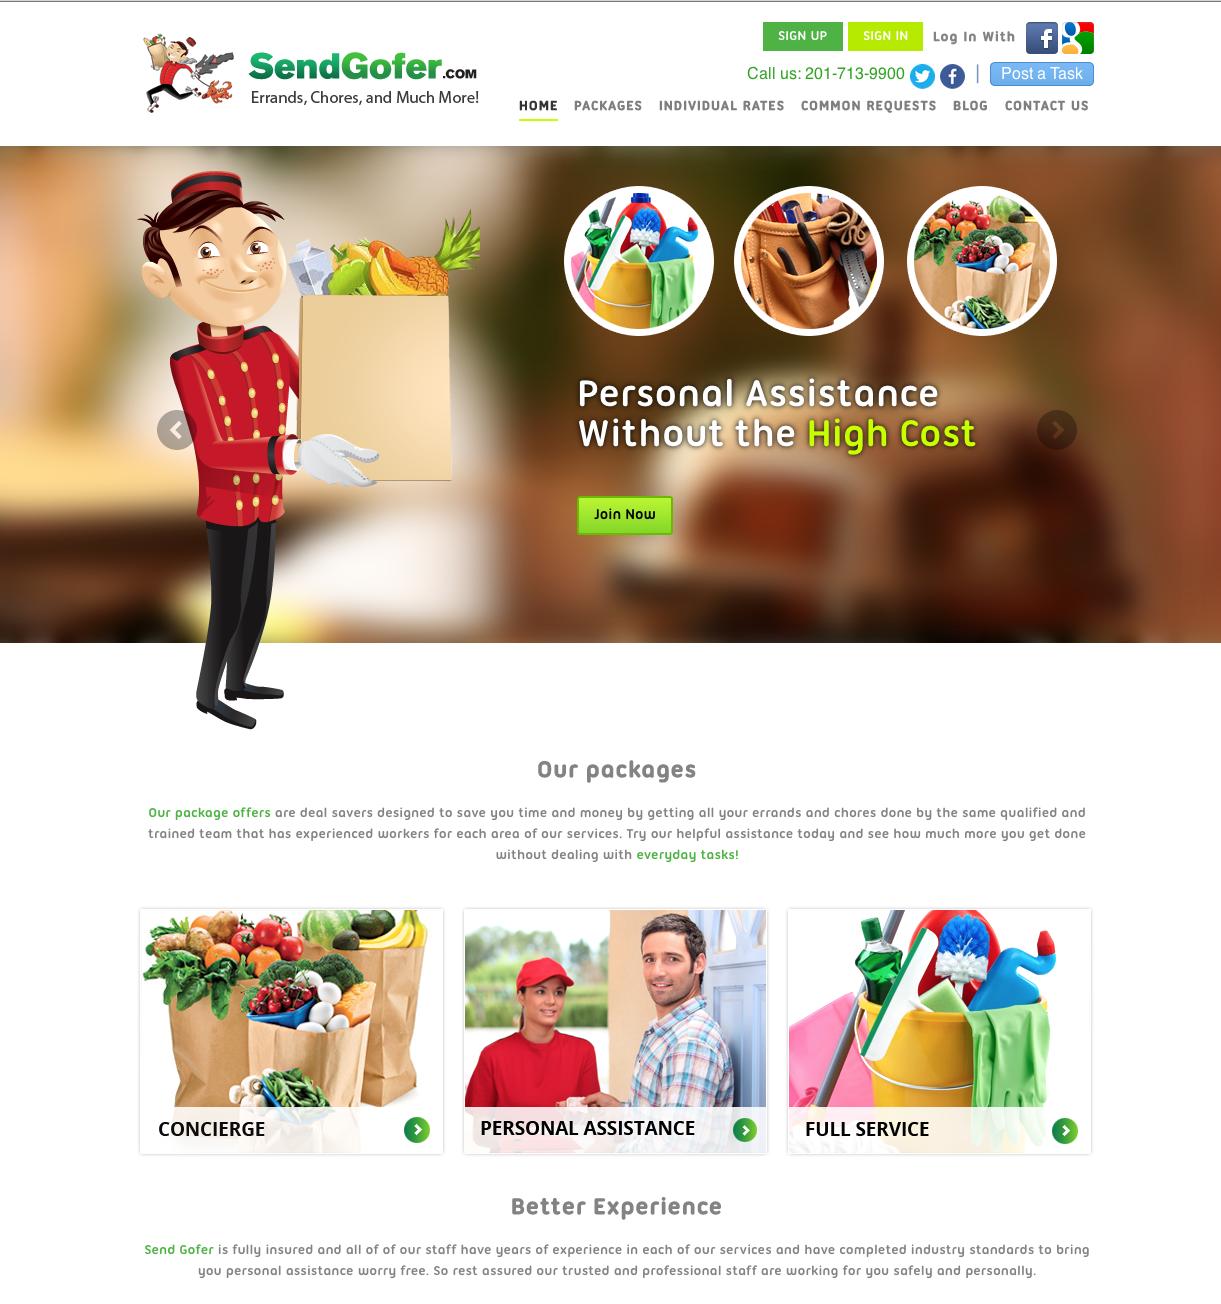 Send Gofer's Home Page